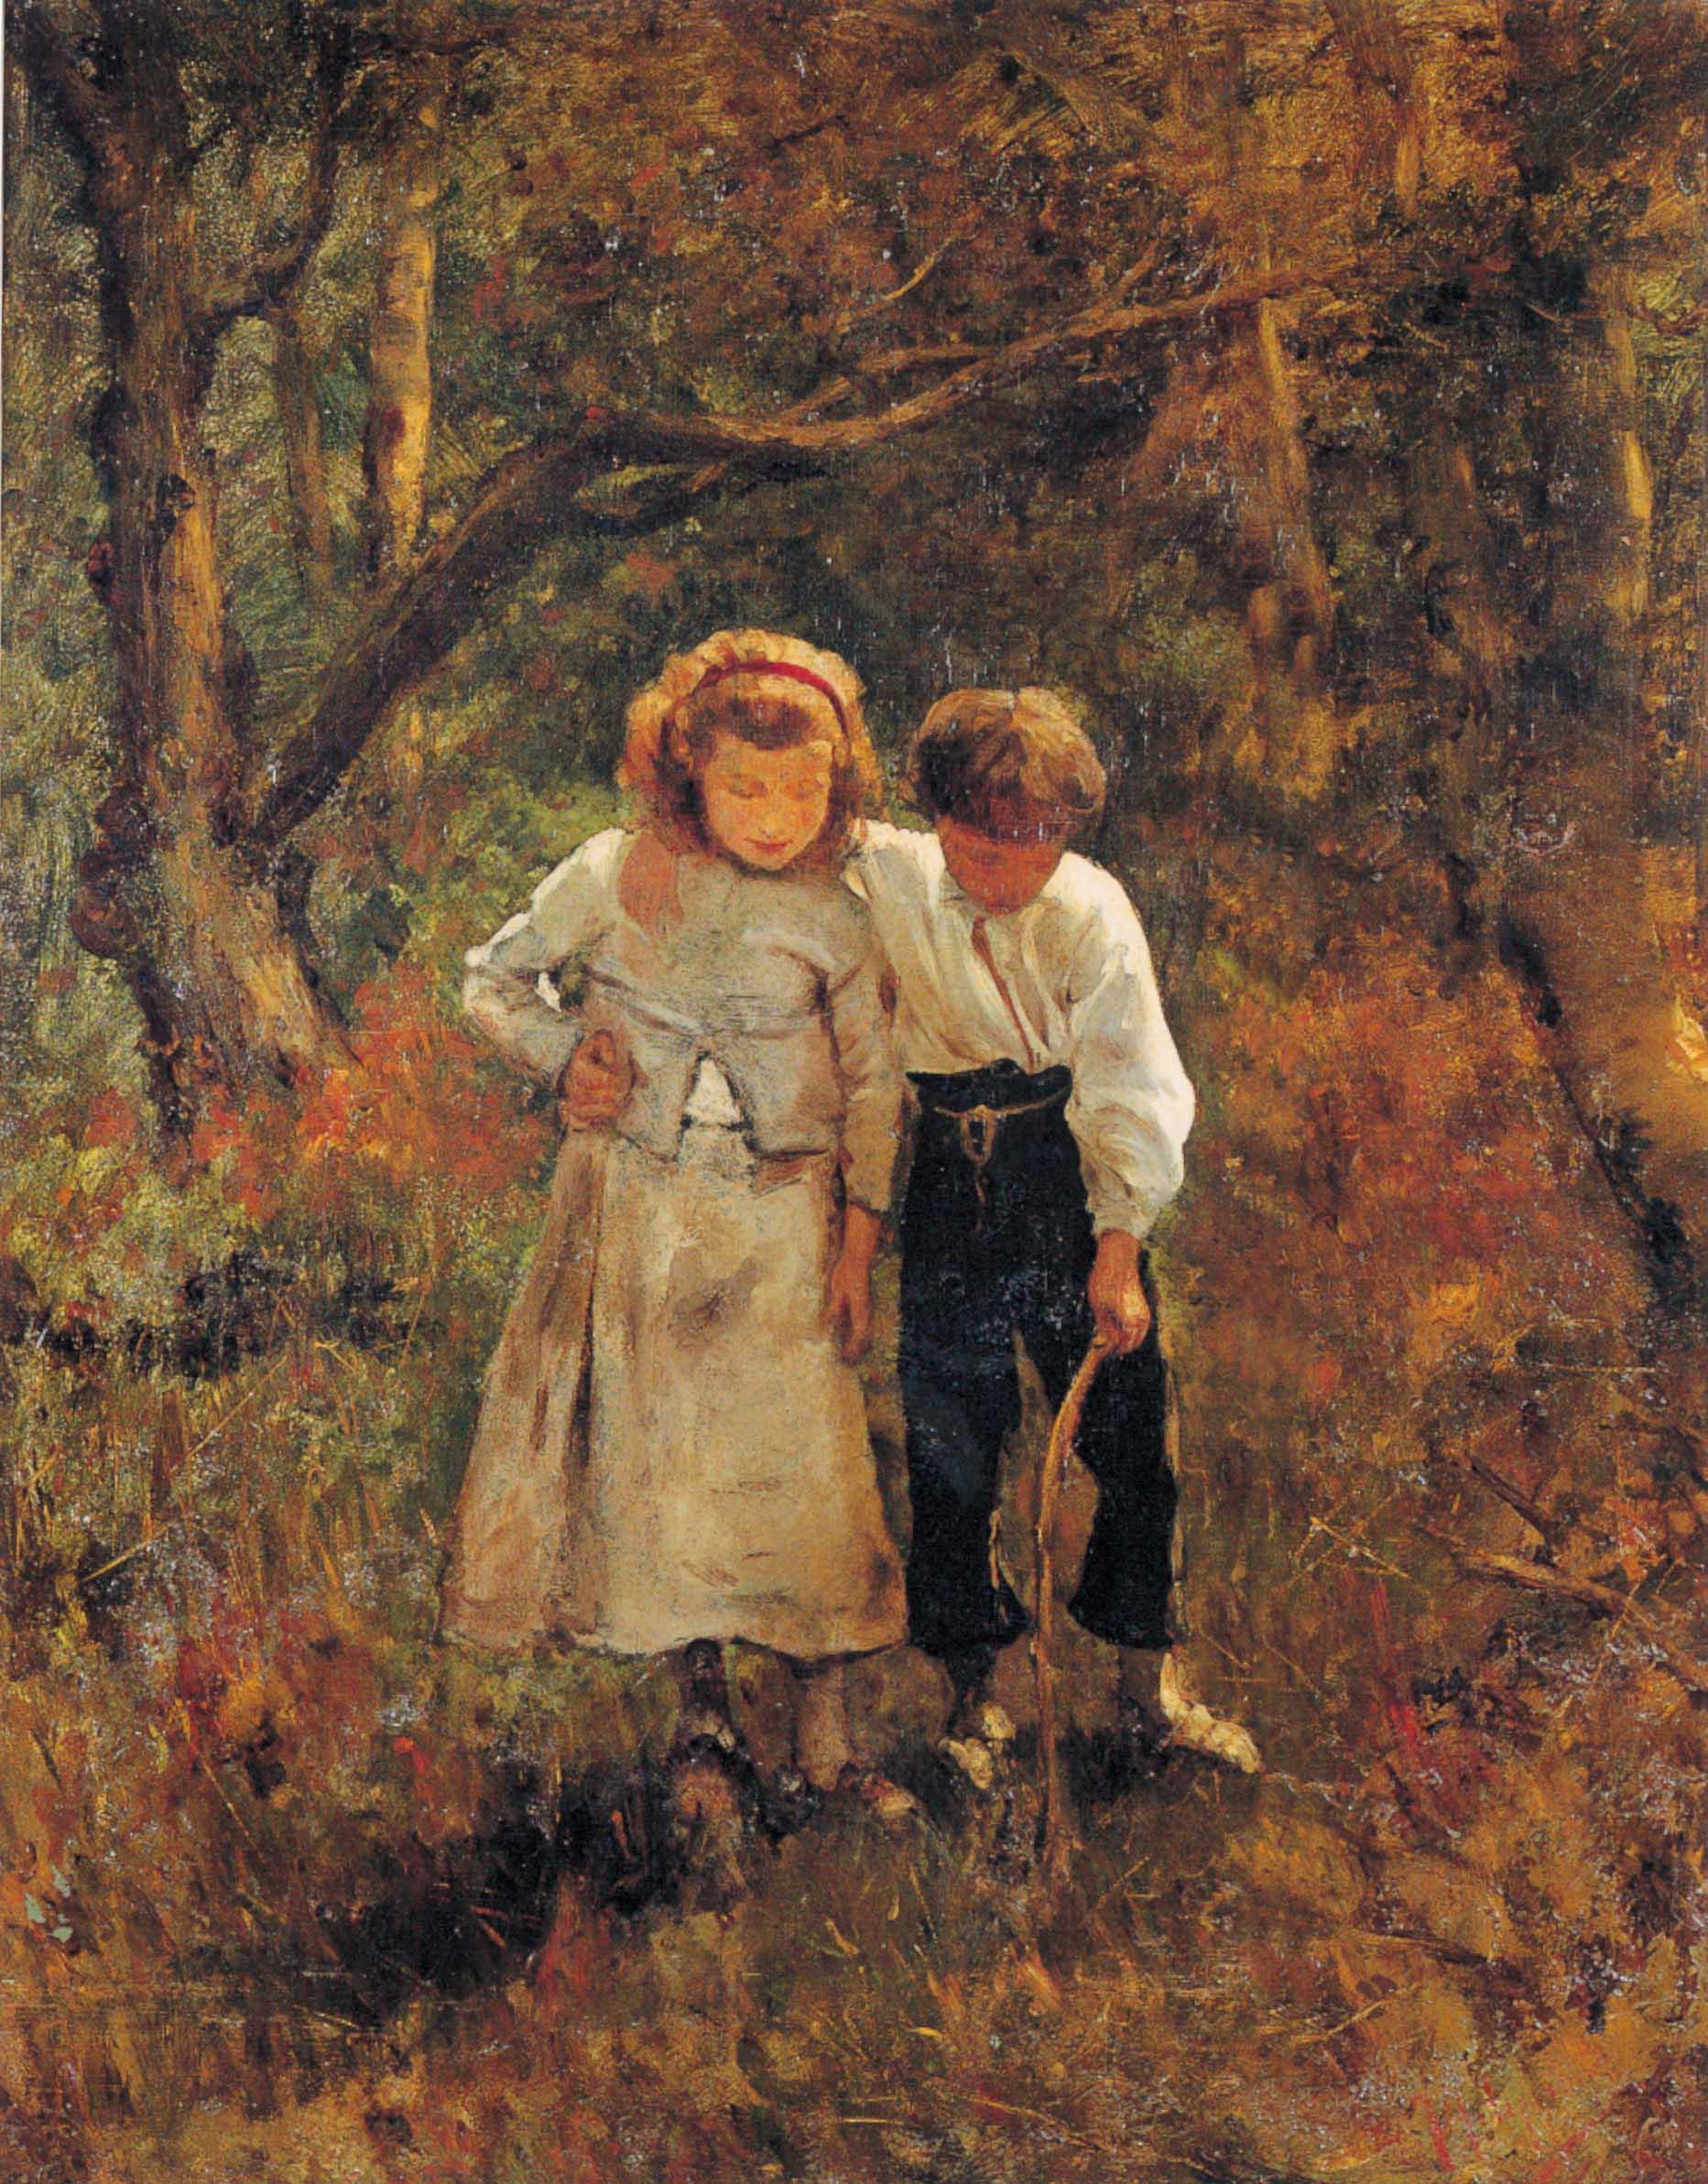 """In cerca di funghi"", 1879-80 circa"